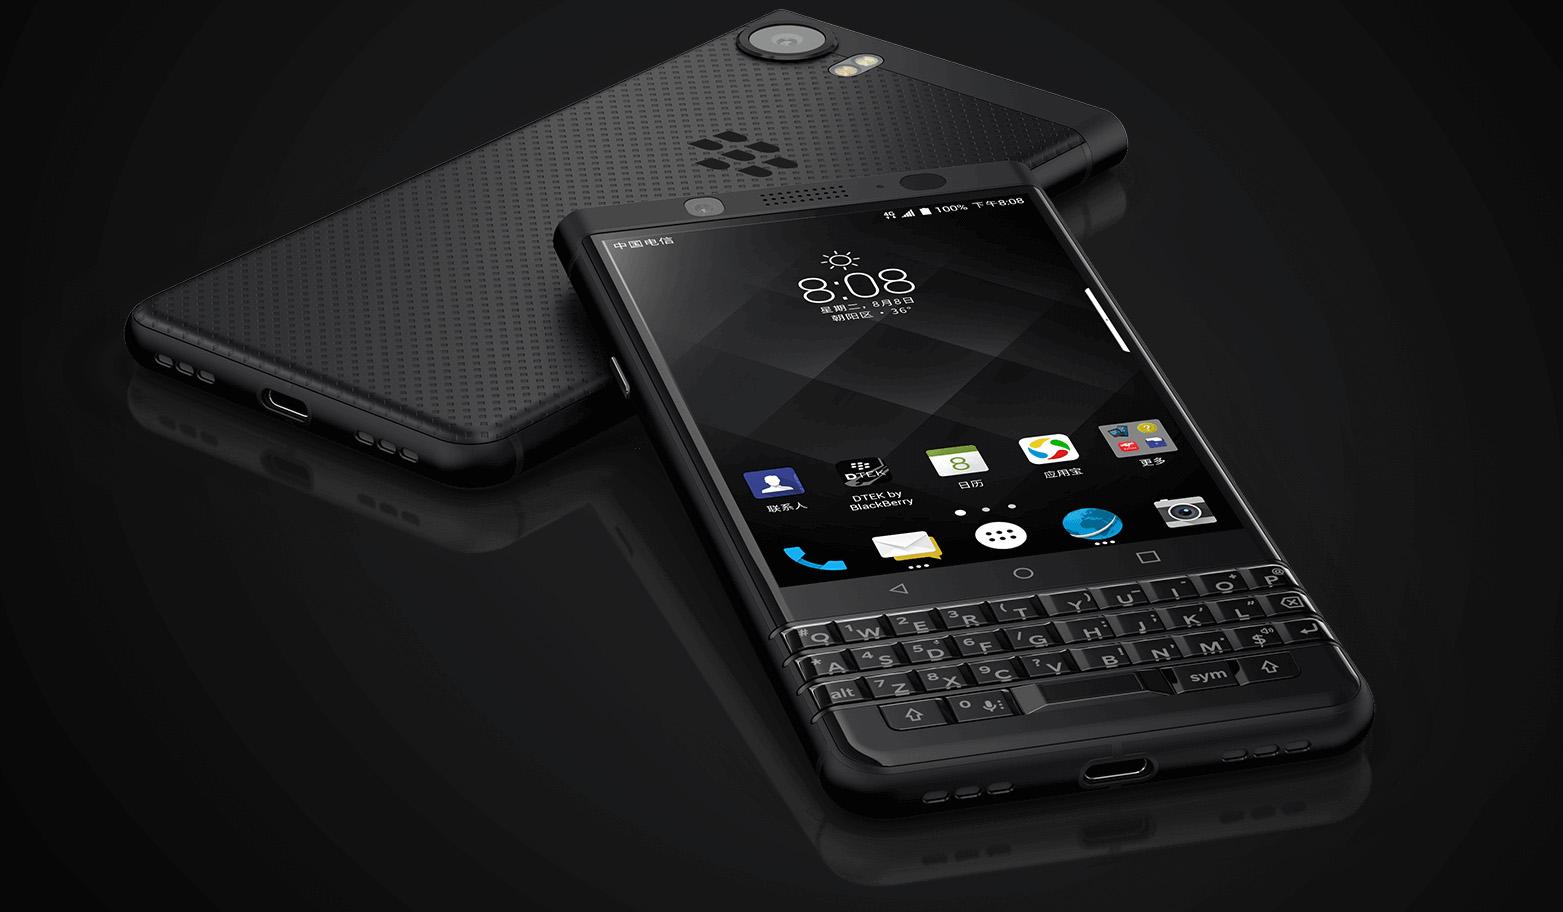 blackberry-keyone-limited-edition-black-12.jpg